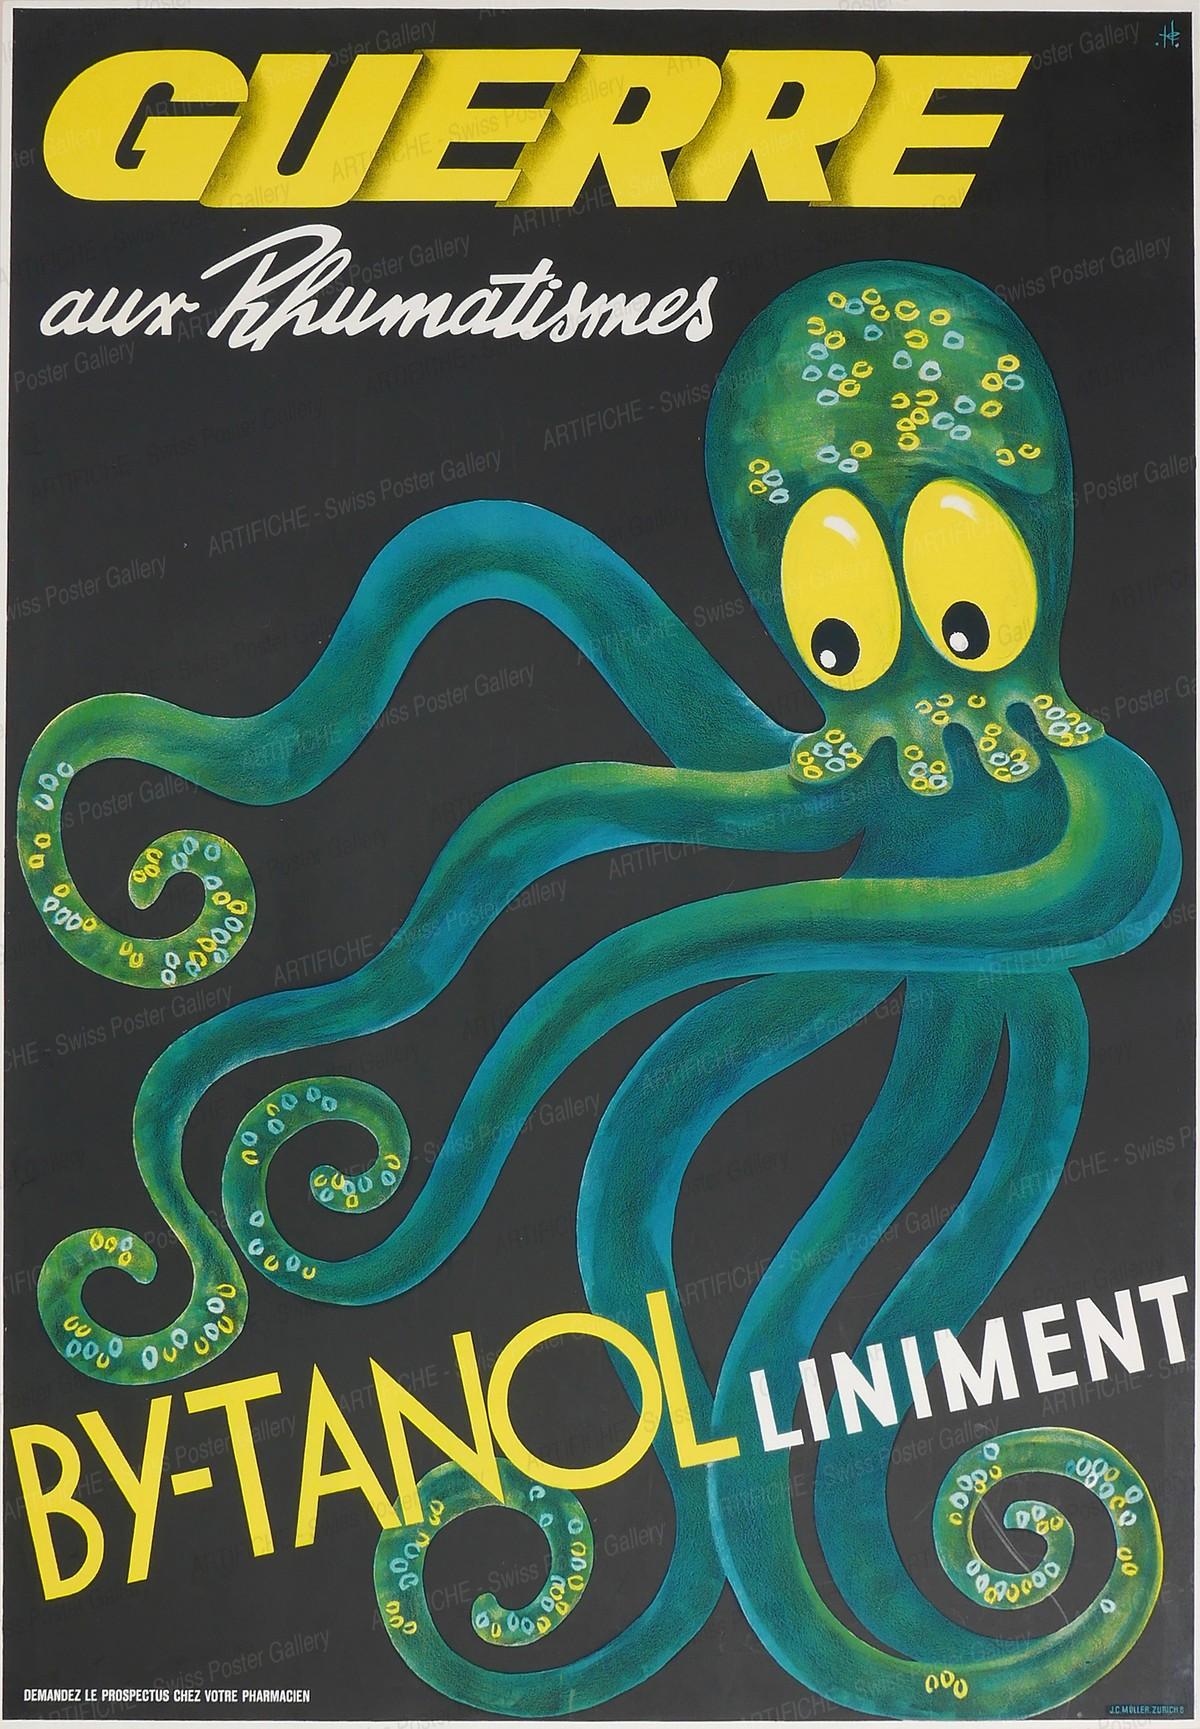 BYTANOL – Guerre aux Rhumatismes, Hubert